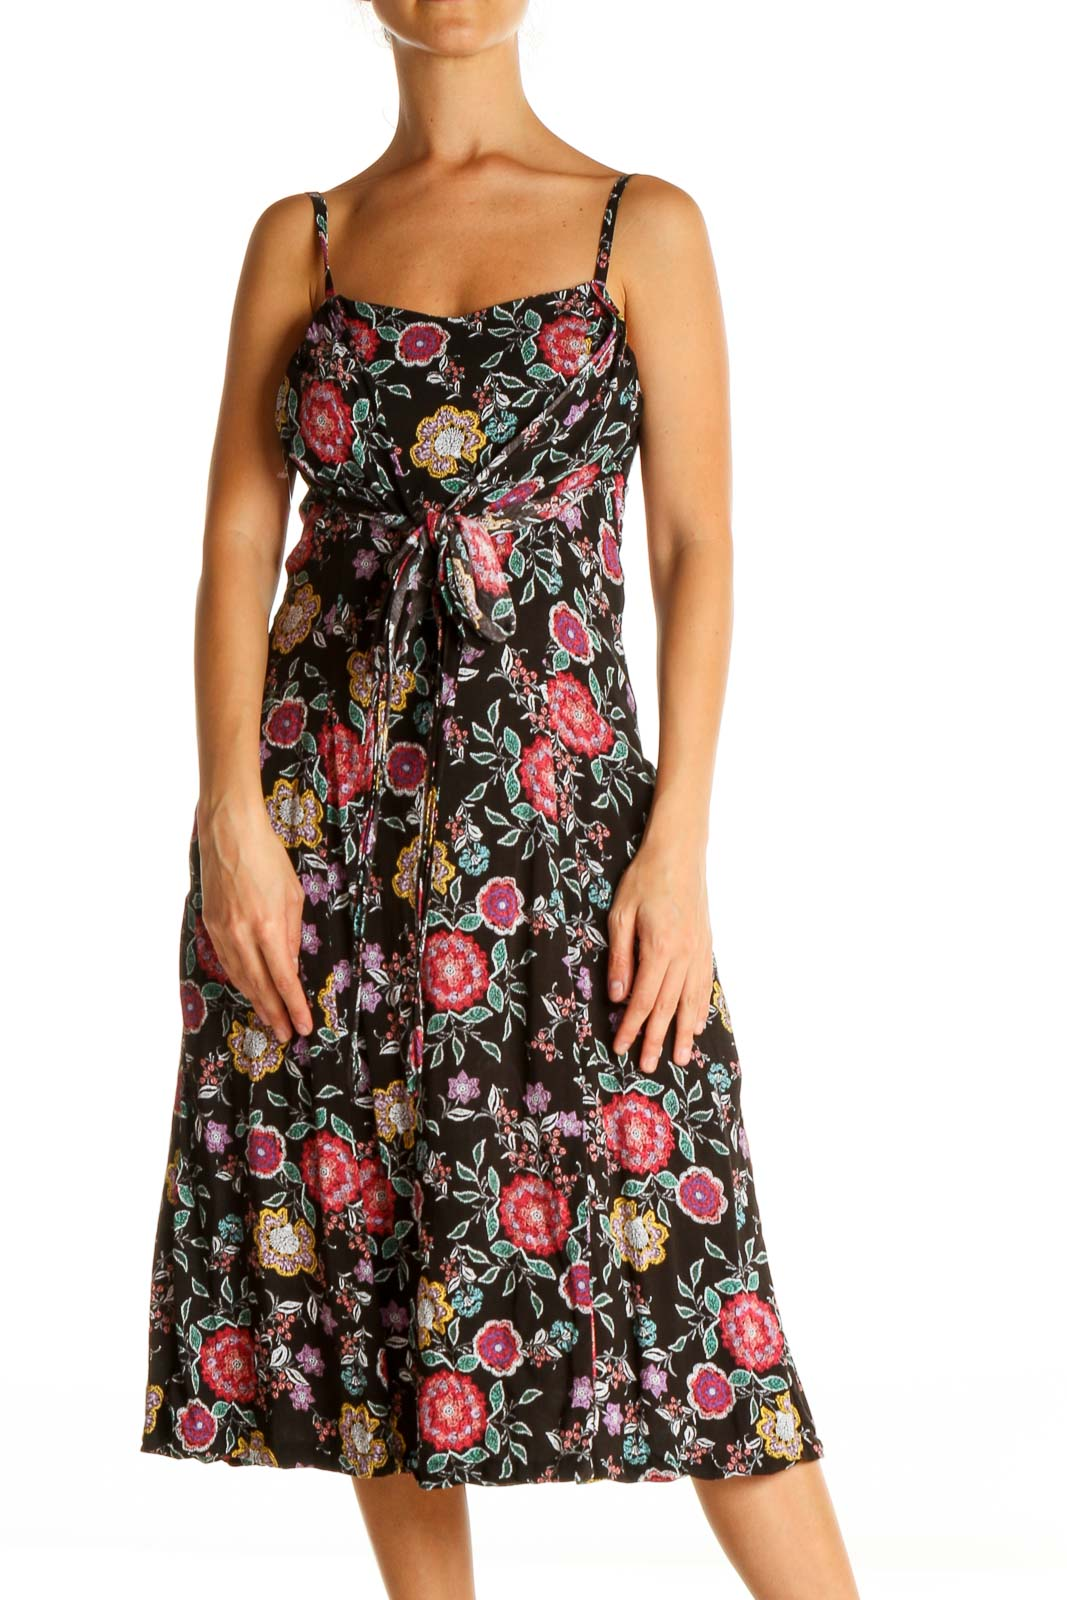 Black Floral Print Retro Fit & Flare Dress Front